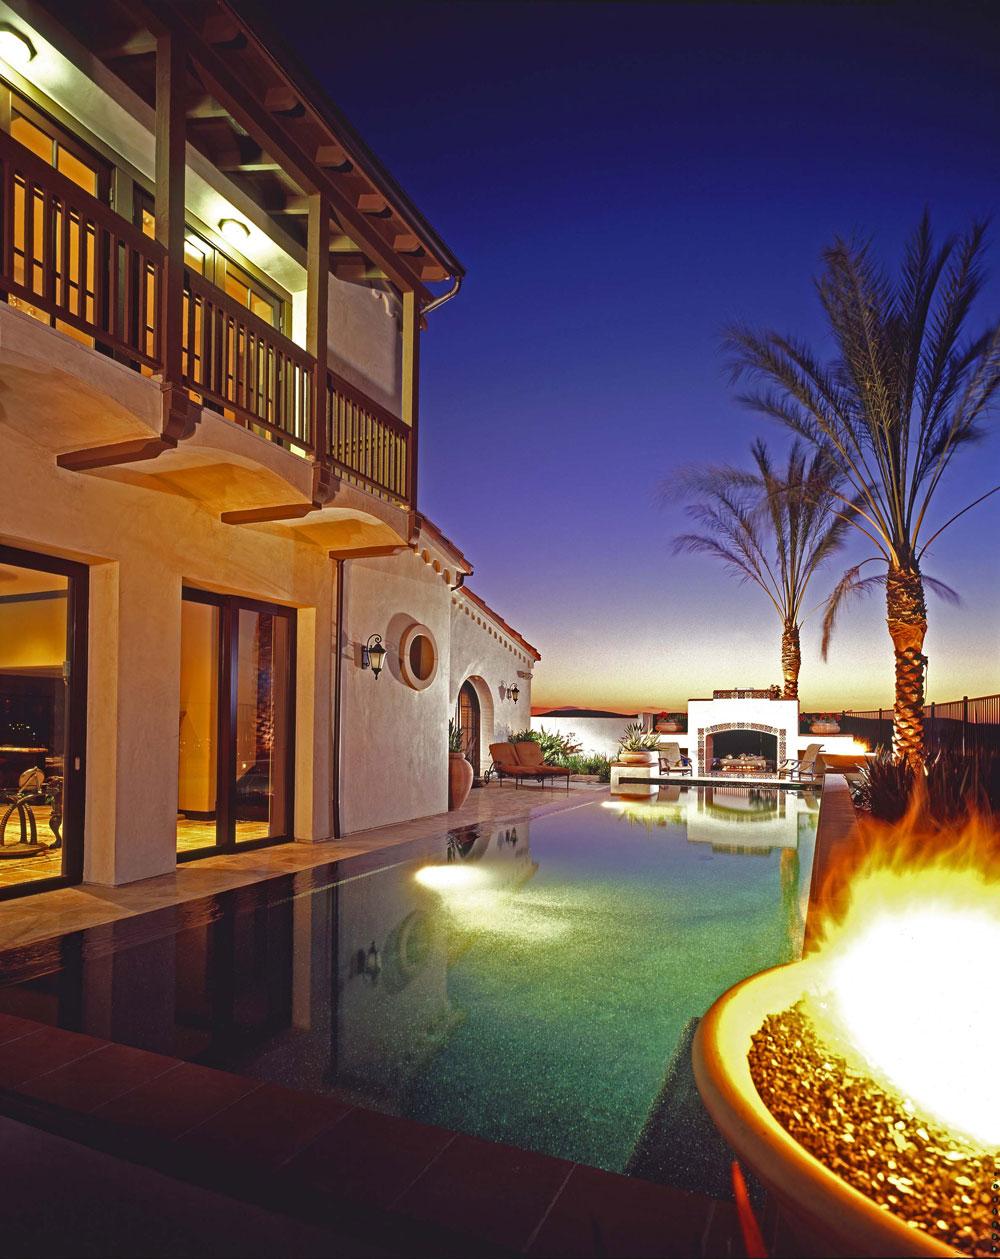 Spanish-Colonial-Backyard-Pool-Patio-Fireplace-Corbin-Reeves.jpg